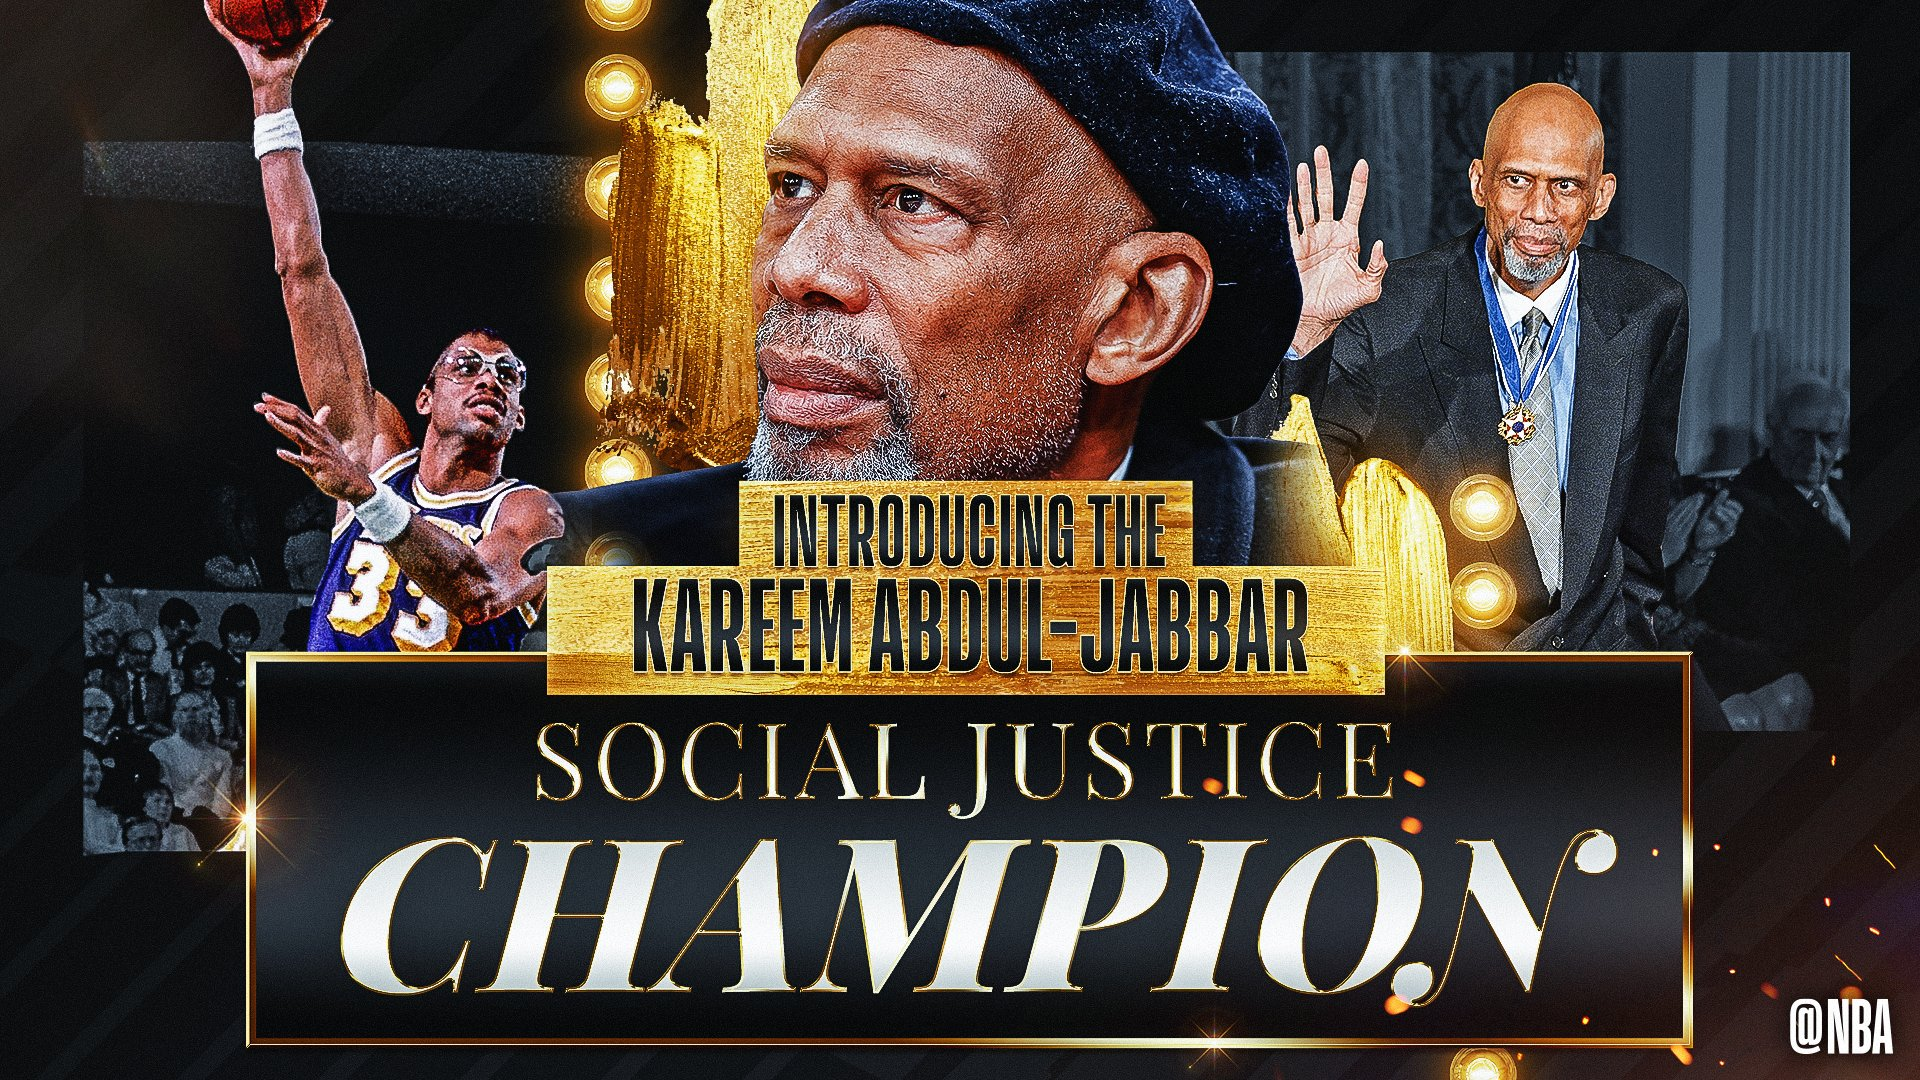 NBA creates annual Kareem Abdul-Jabbar Social Justice Award